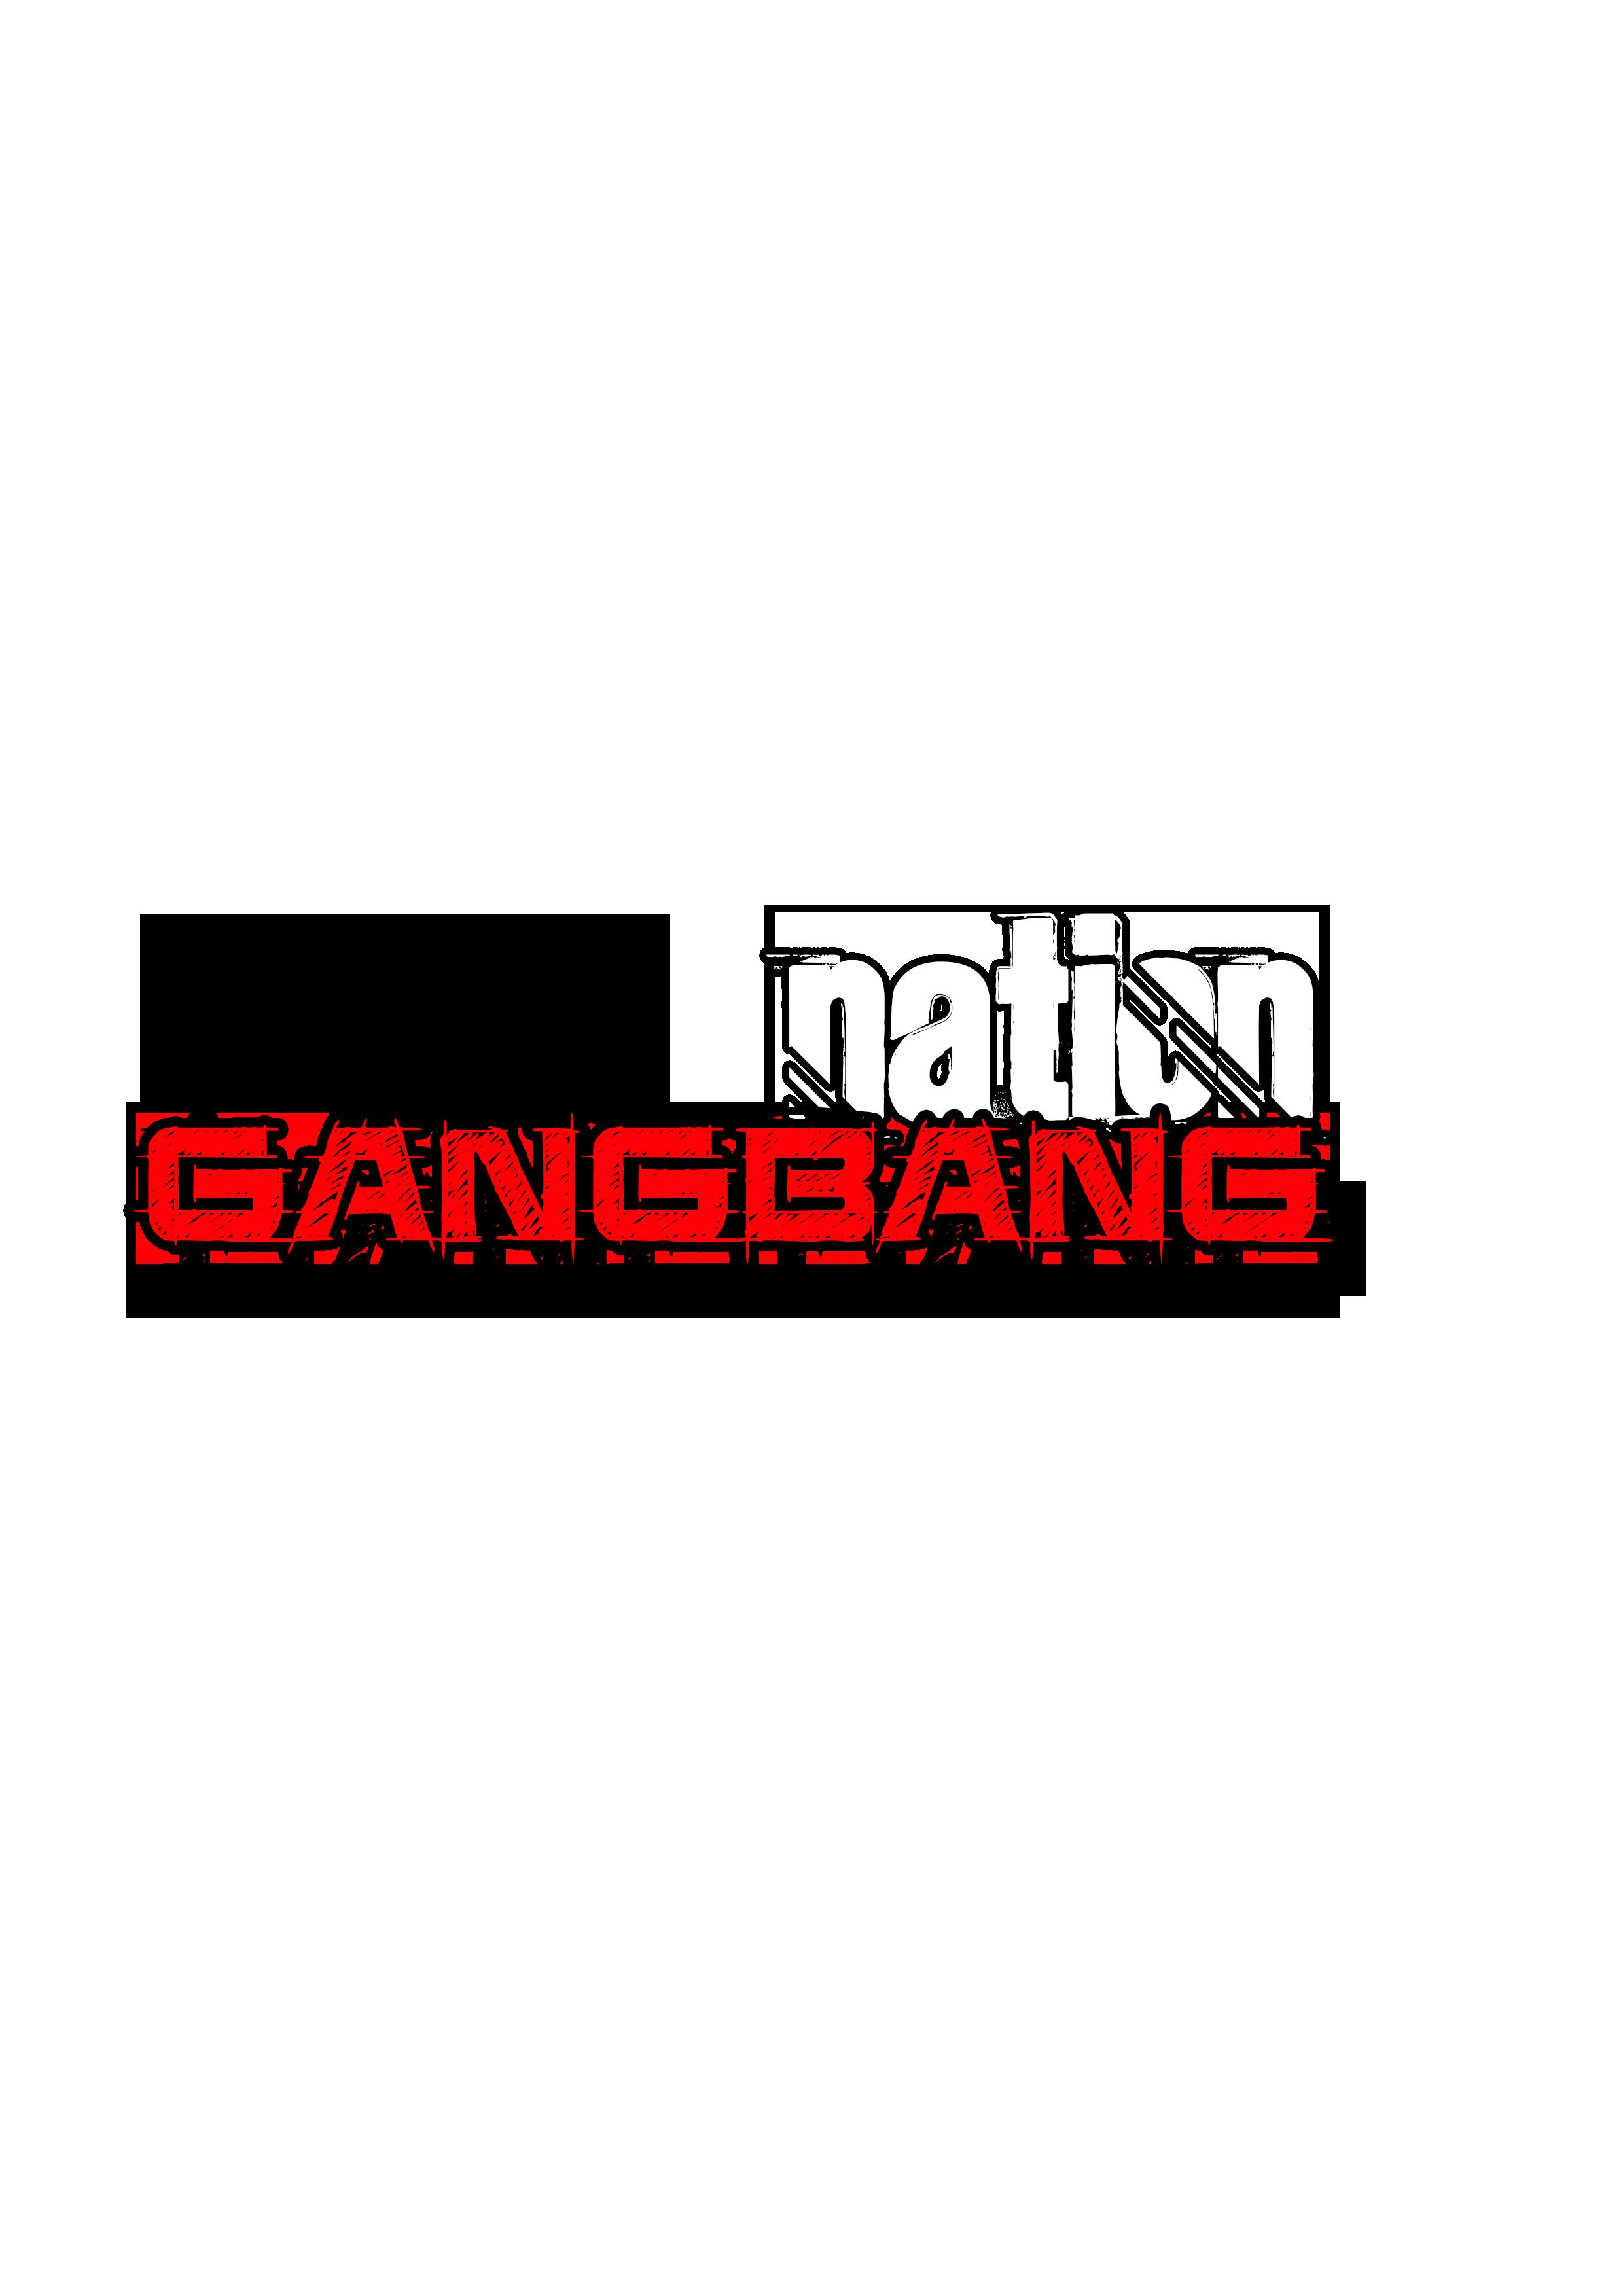 gangbang belgie gangbang advertentie